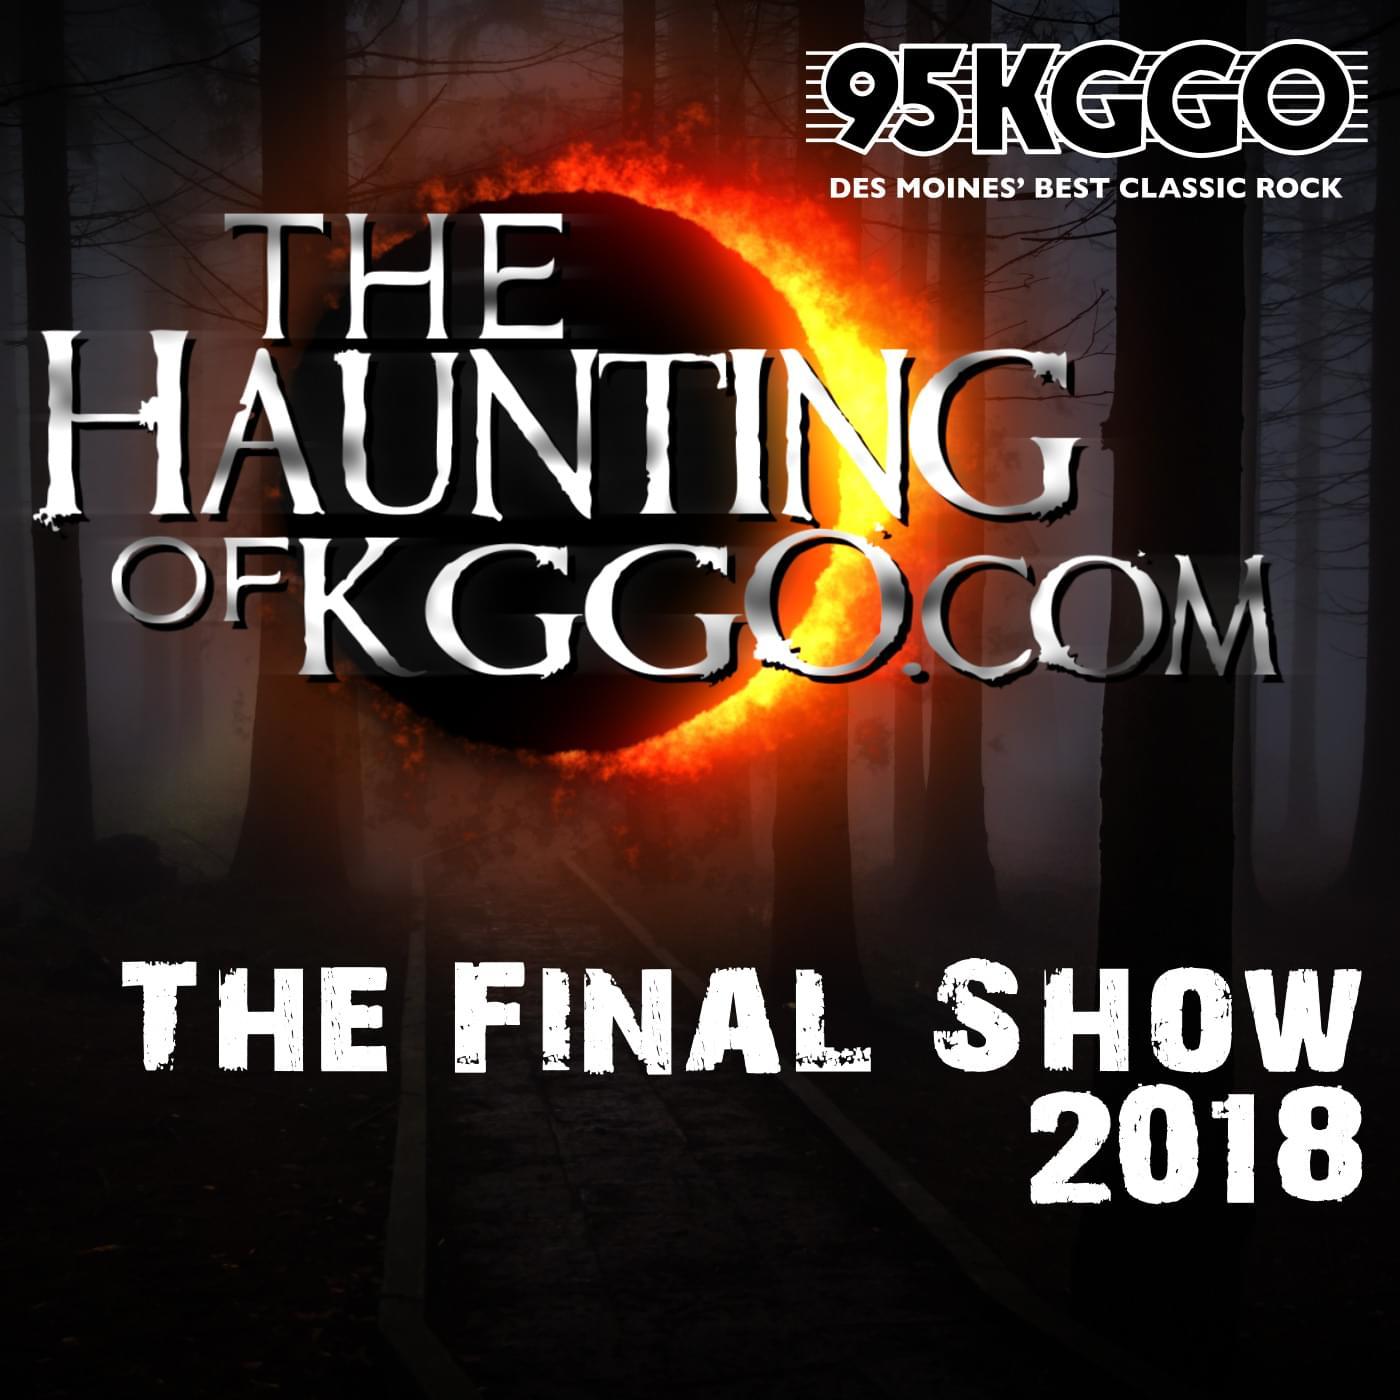 Haunting of KGGO.com – The Final Show